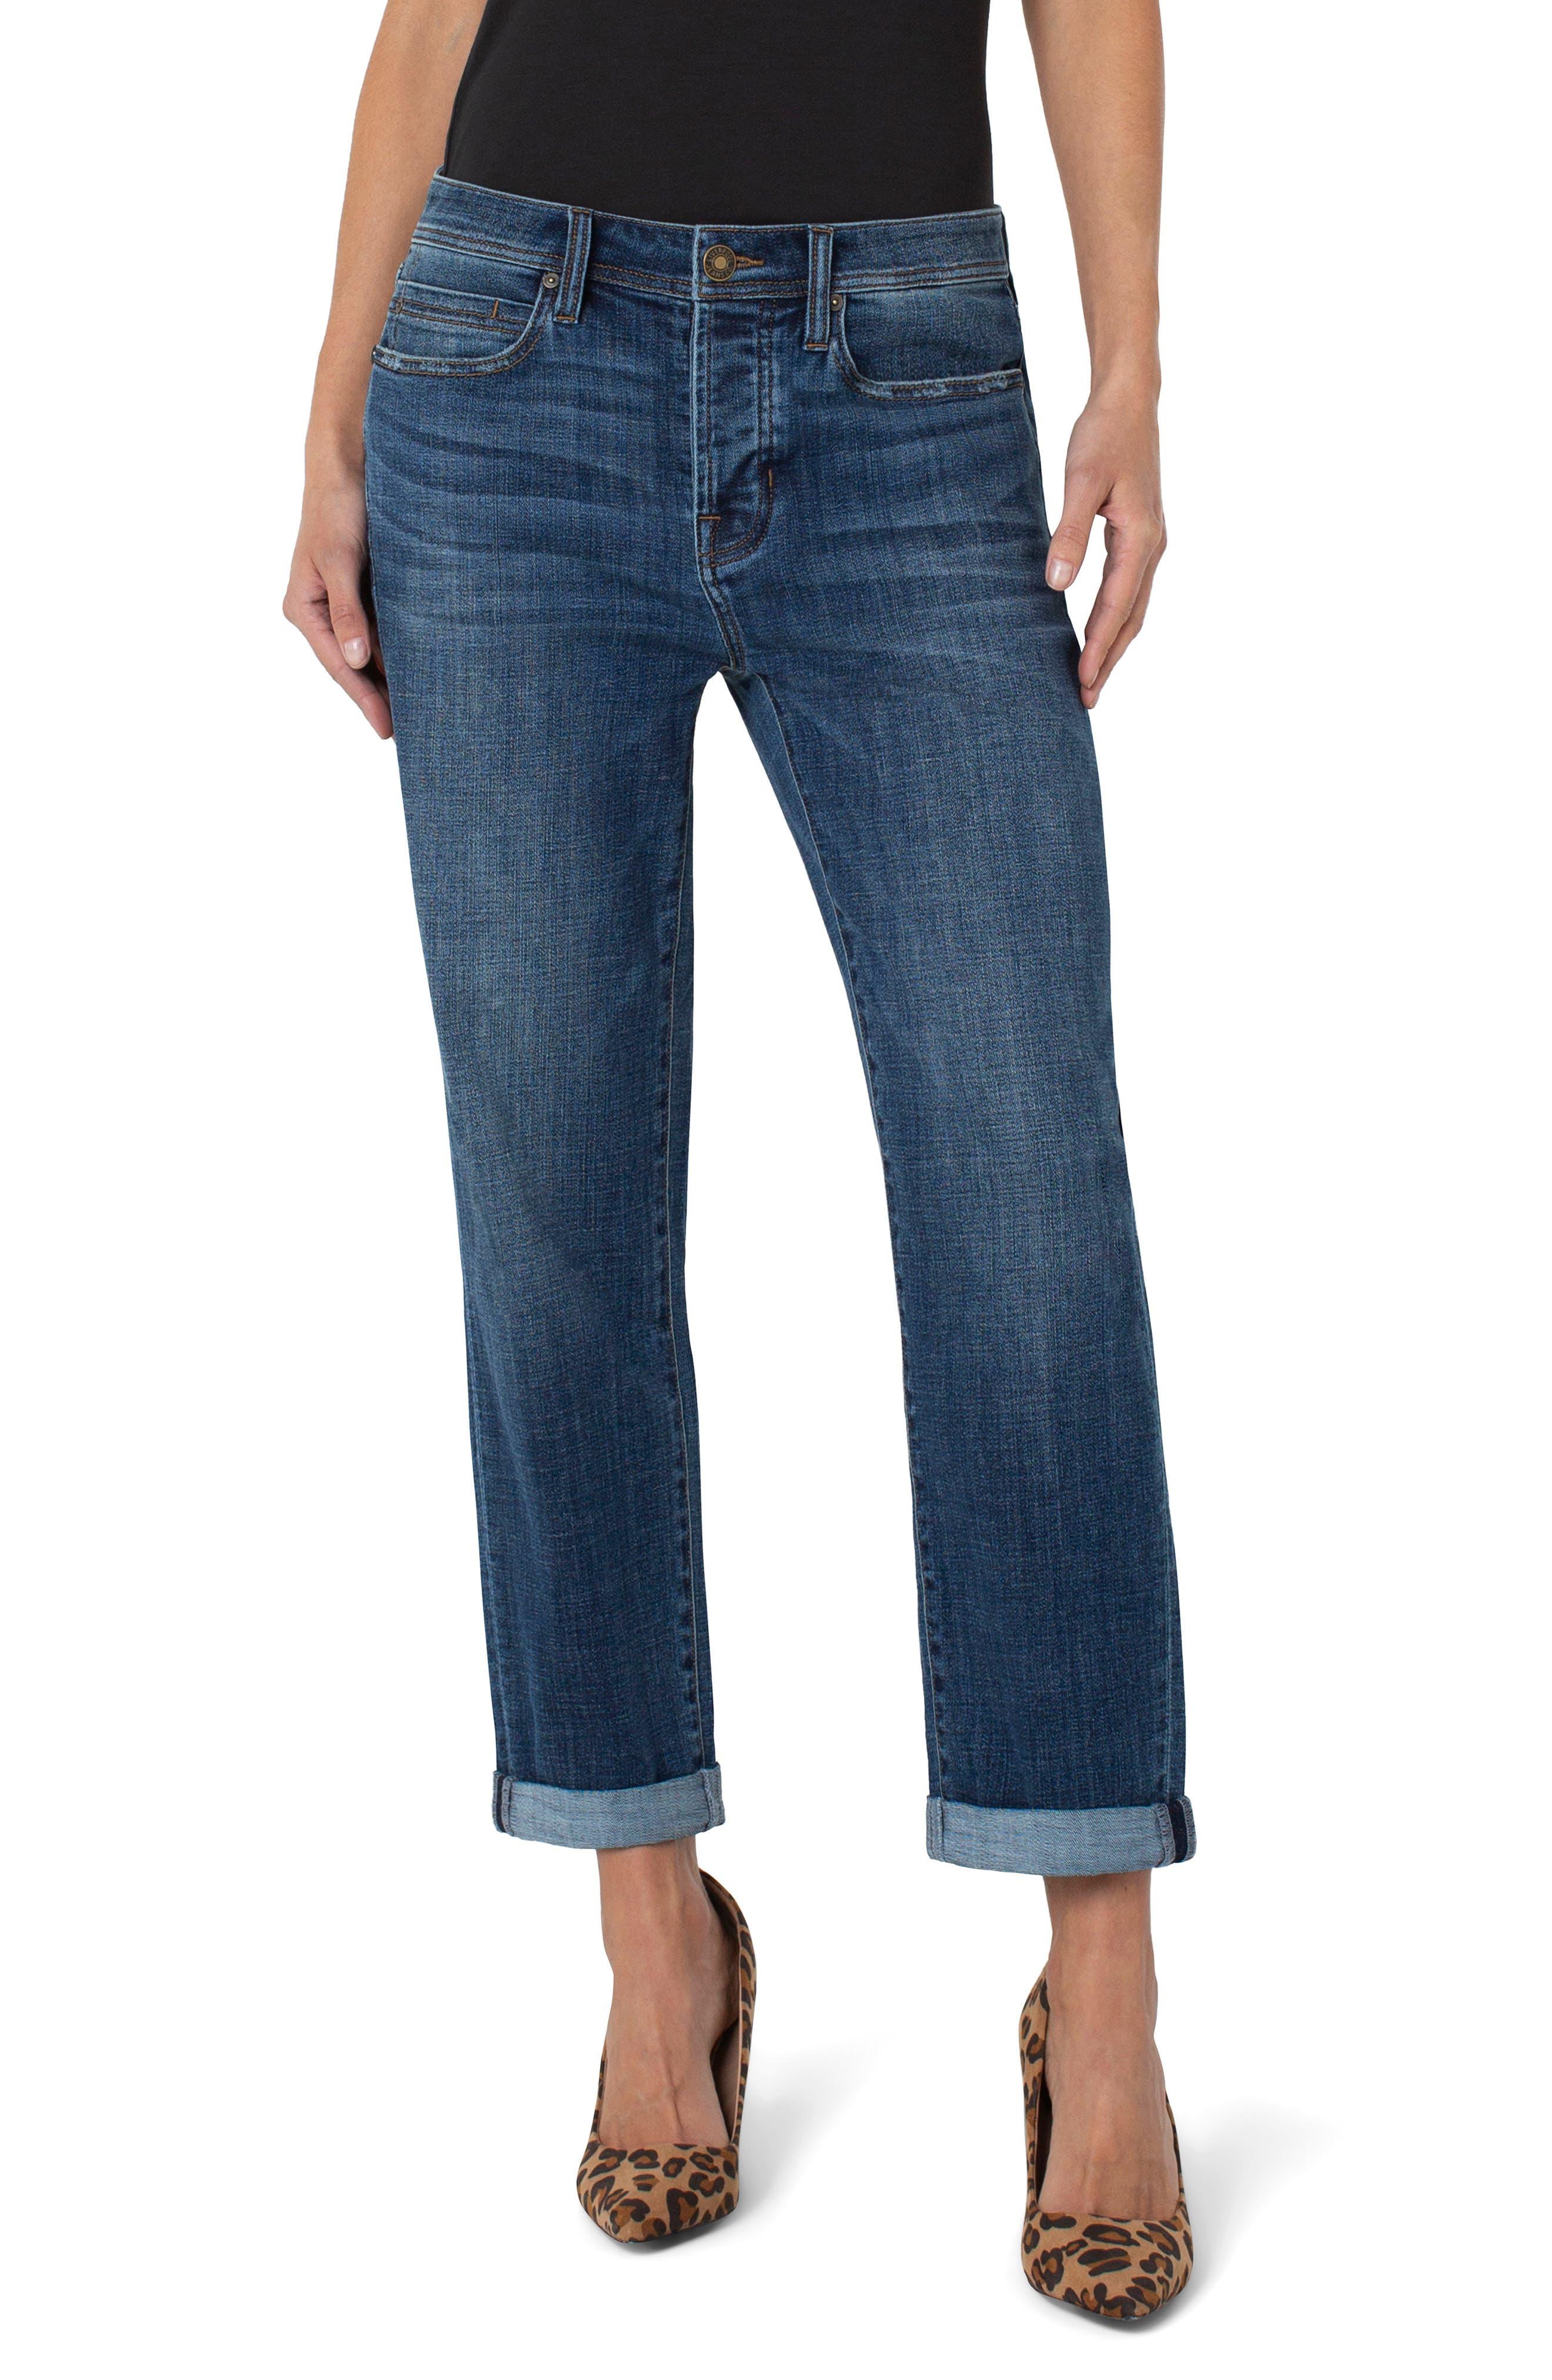 The Real Boyfriend Roll Cuff Jeans